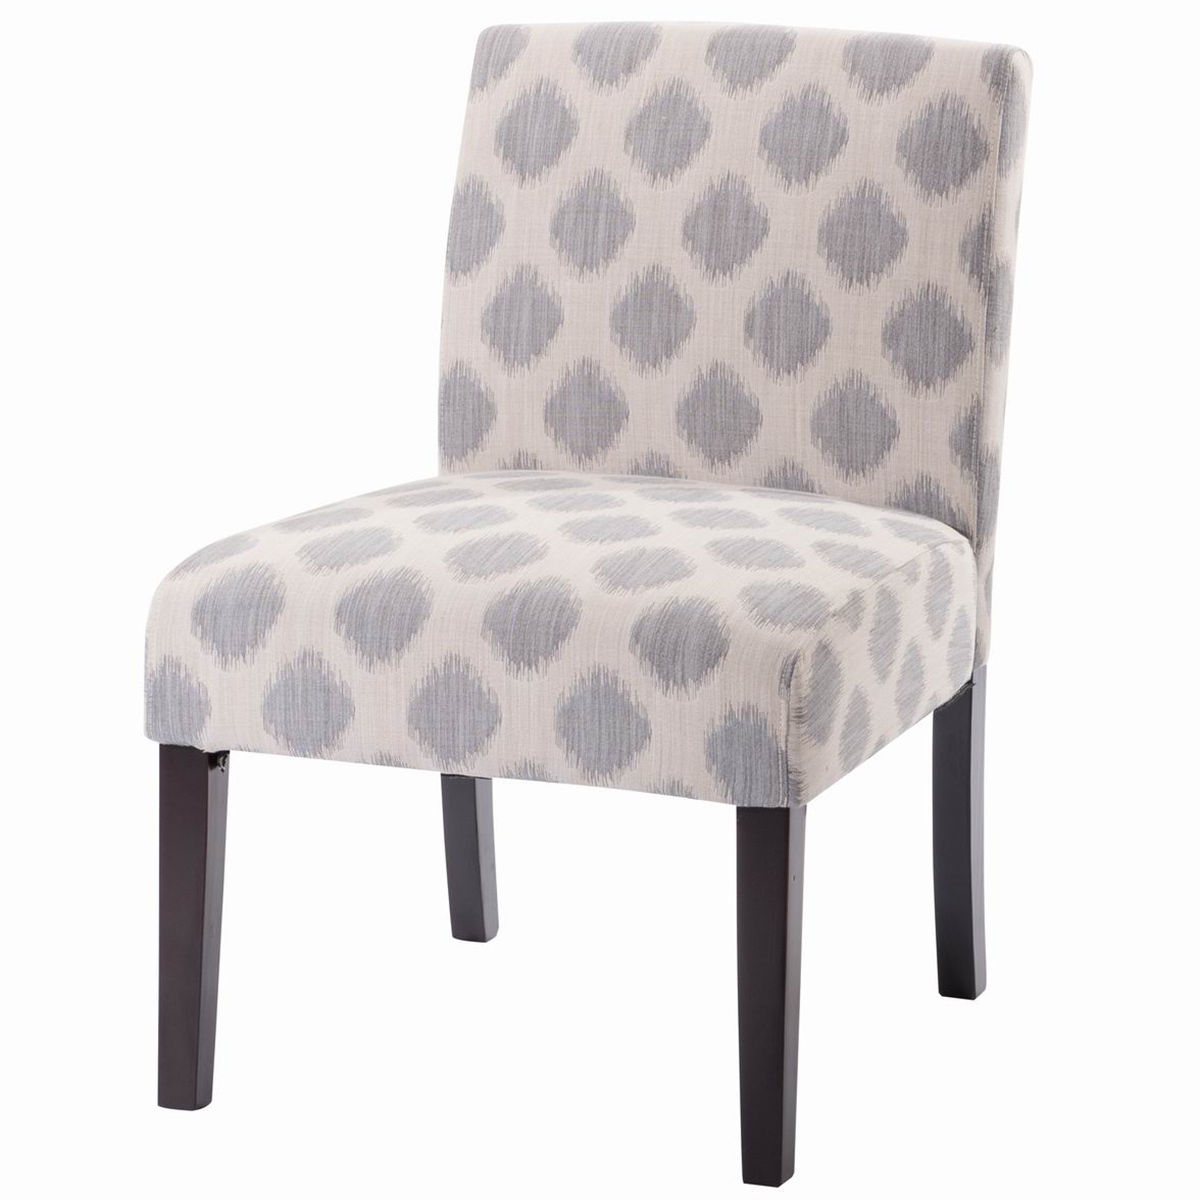 купить Giantex Chic Plaid Dining Chair Armless Linen Fabric Upholstered Leisure Chairs Wood Modern Living Room Furniture HW52784 по цене 4016.54 рублей